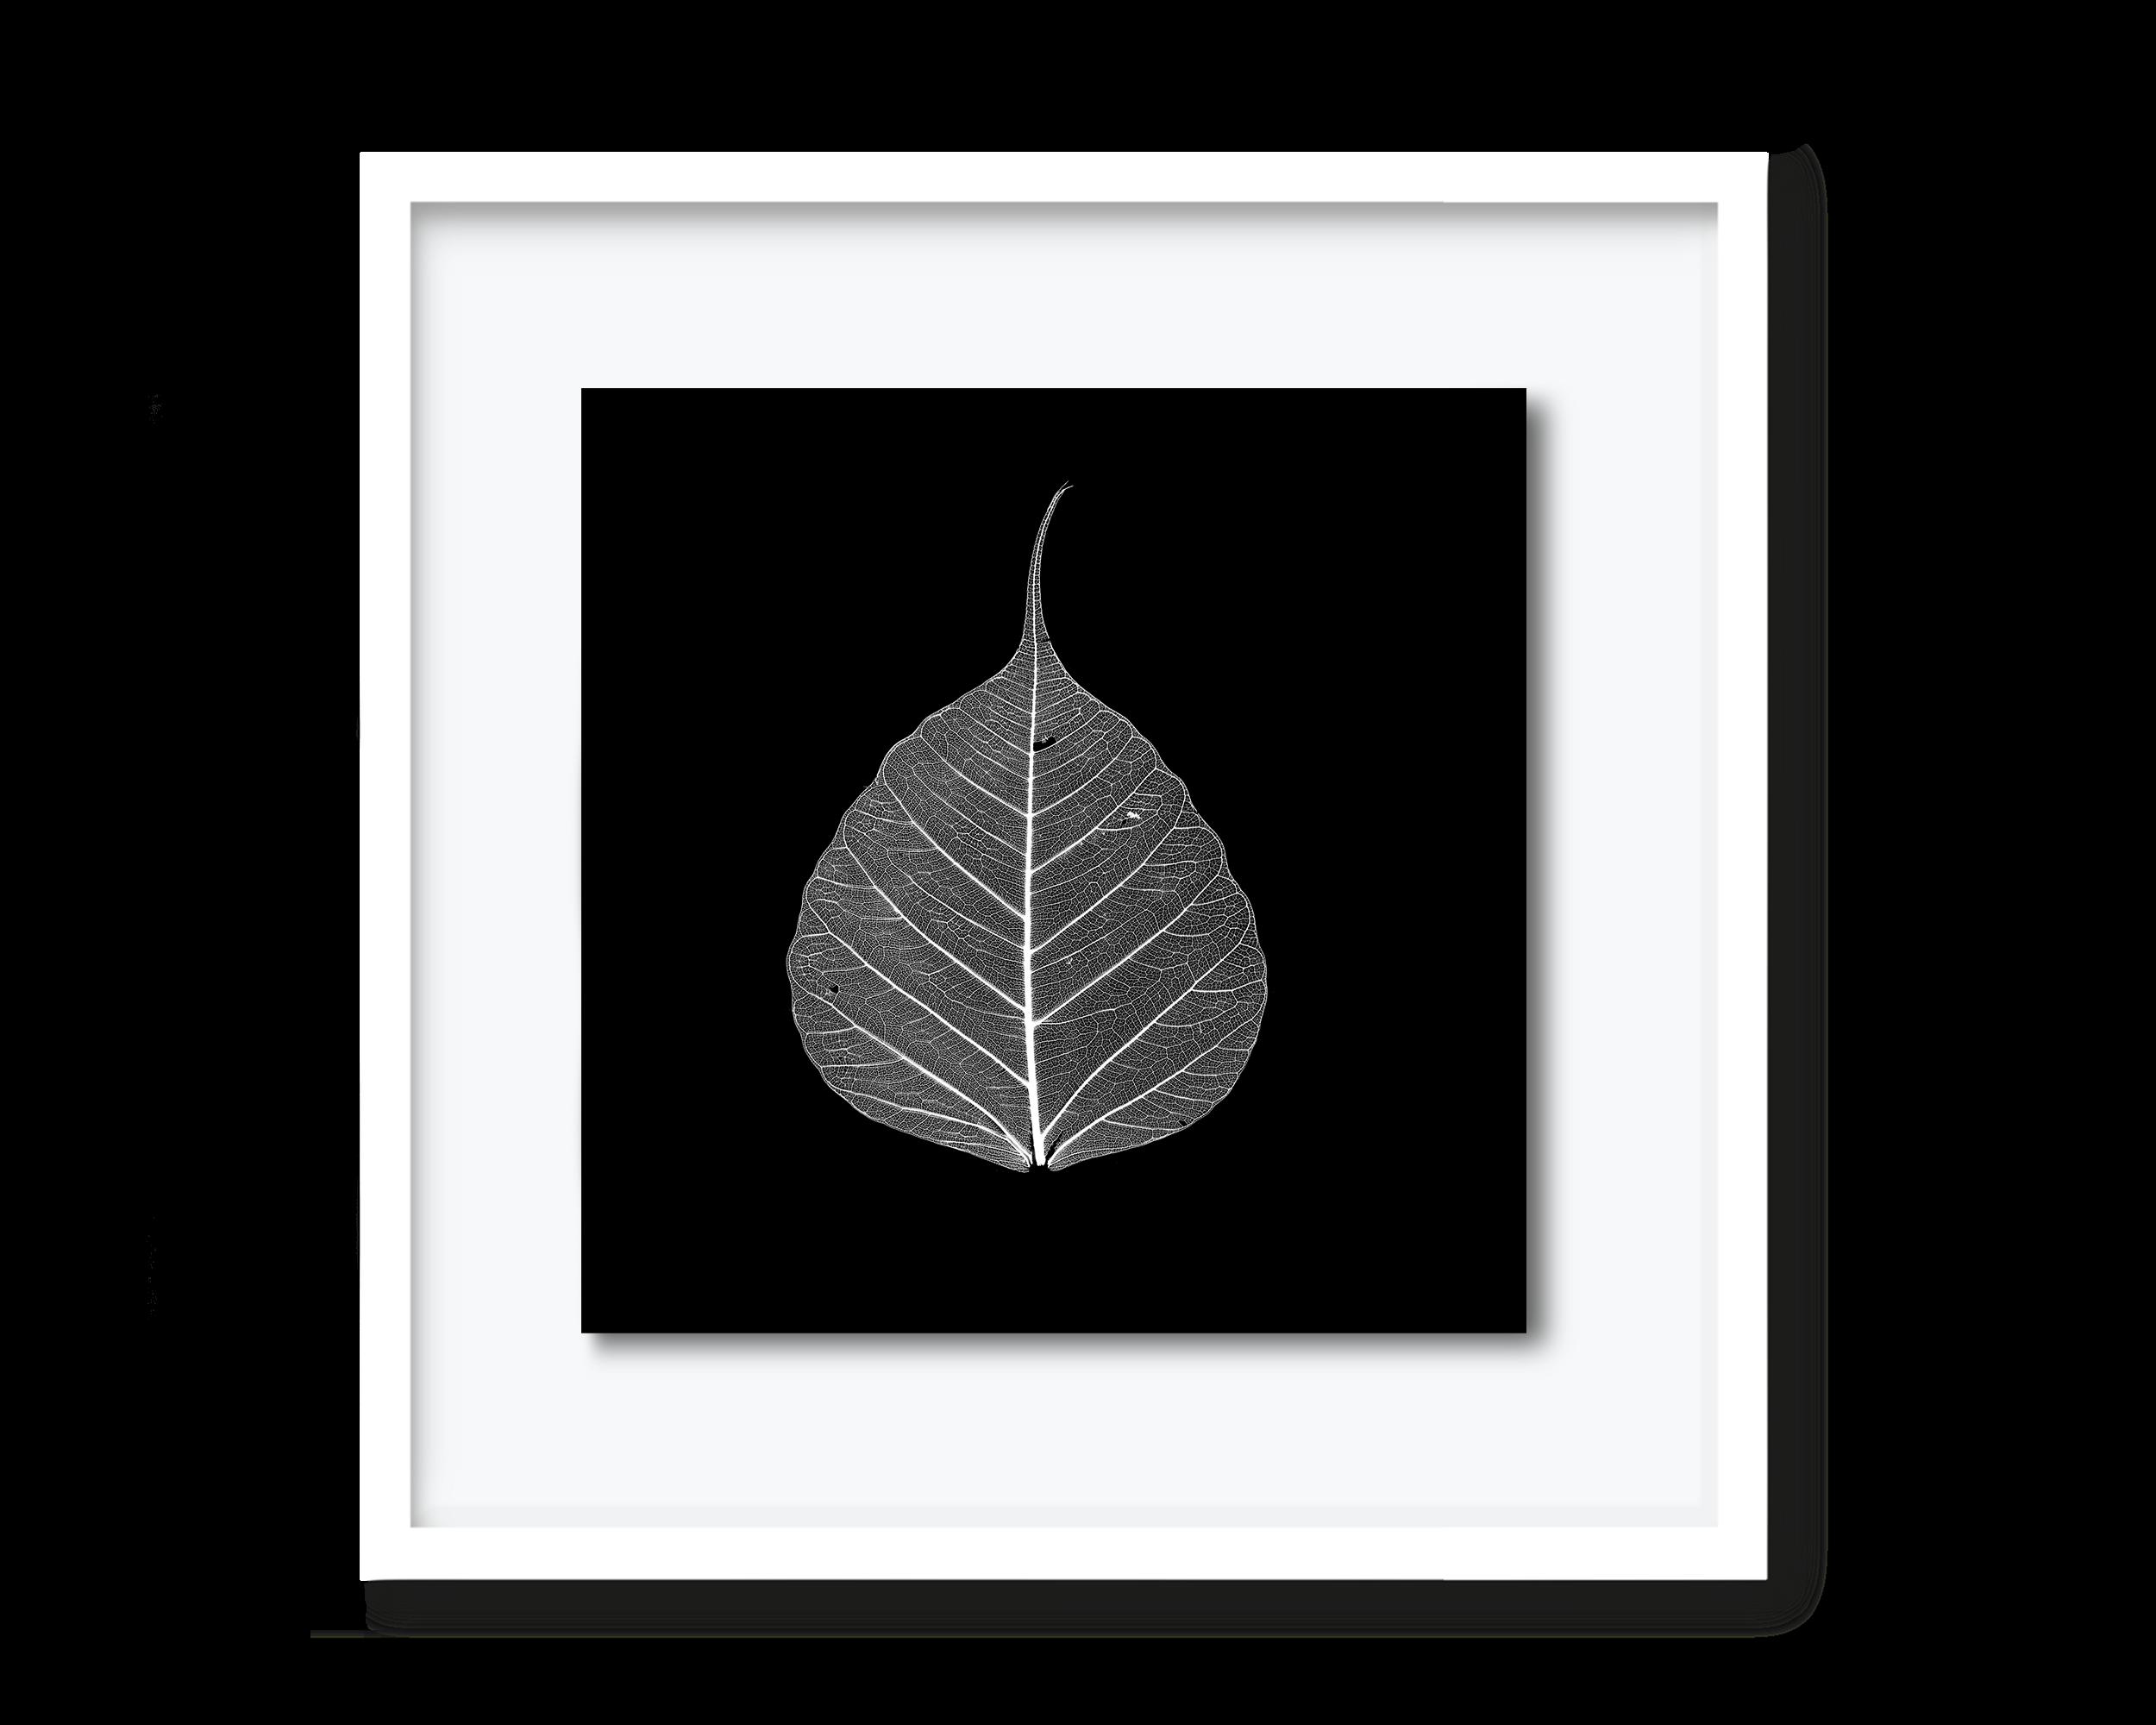 59.david-pearce-leaf.png